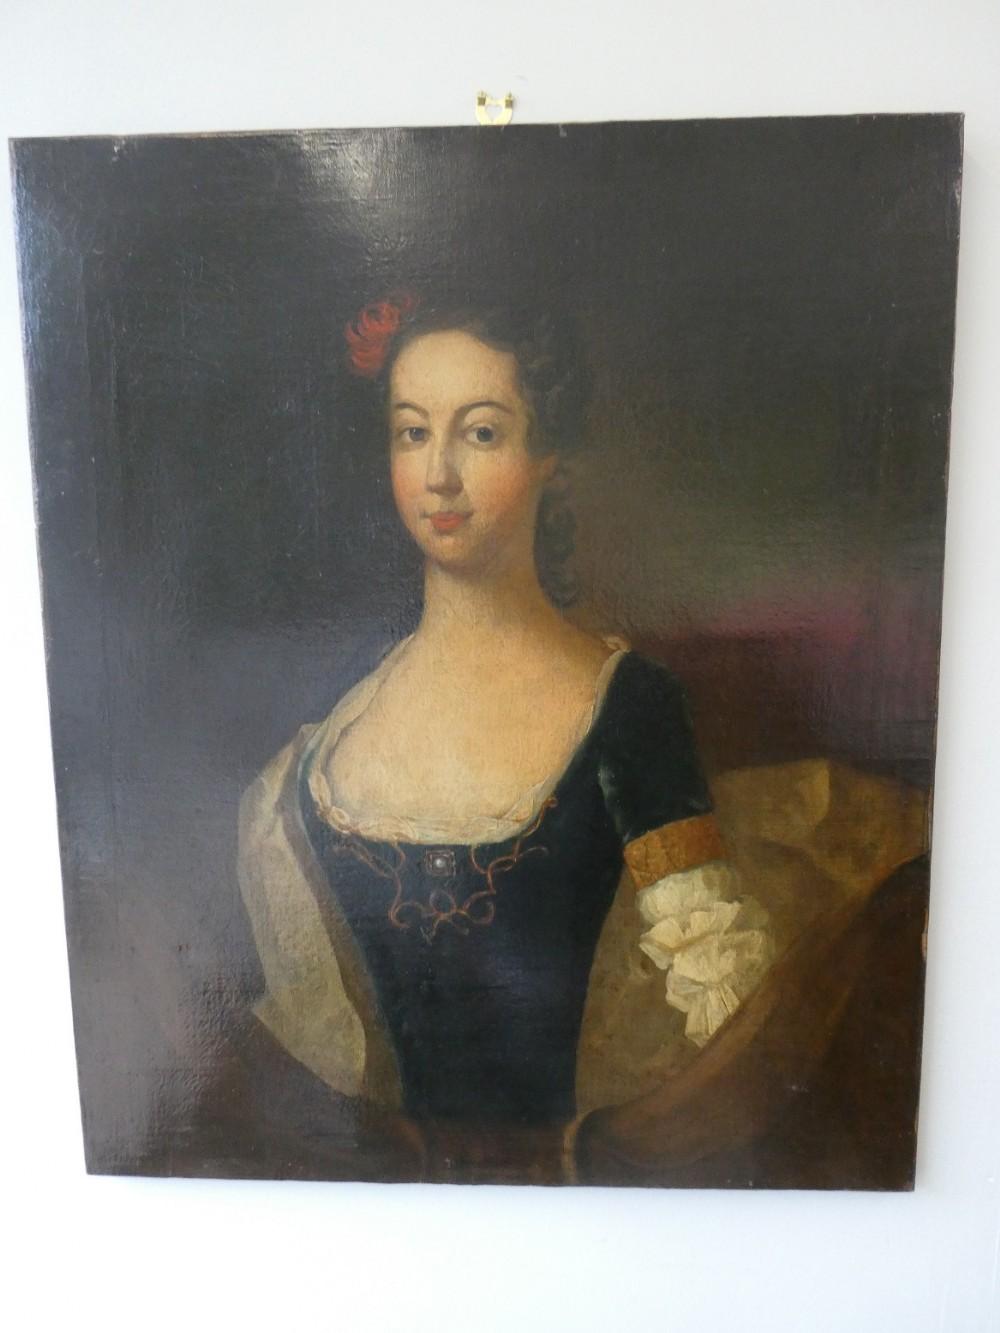 18th century portrait painting